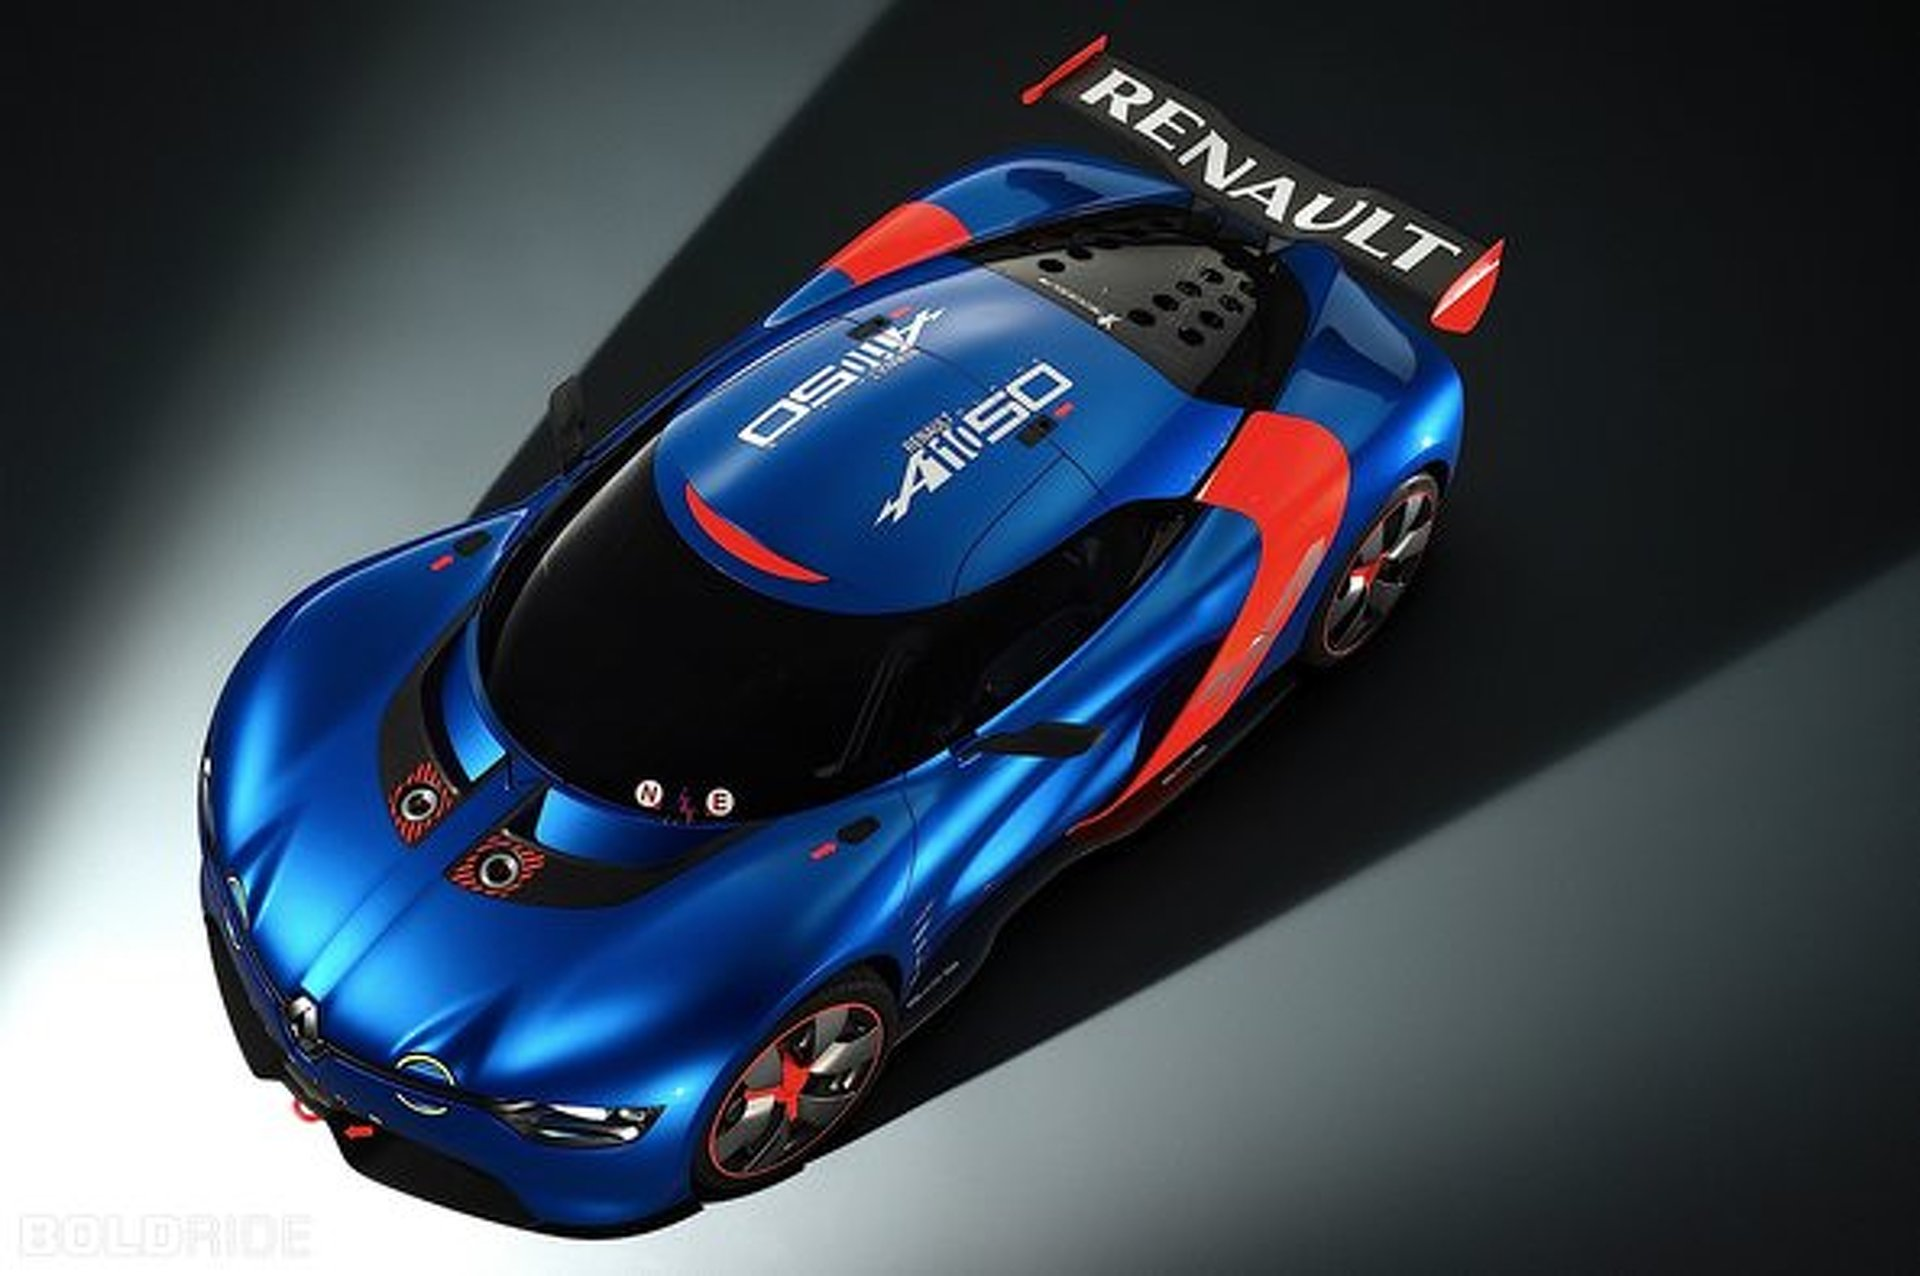 Wheels Wallpaper: Renault Alpine A110-50 Concept